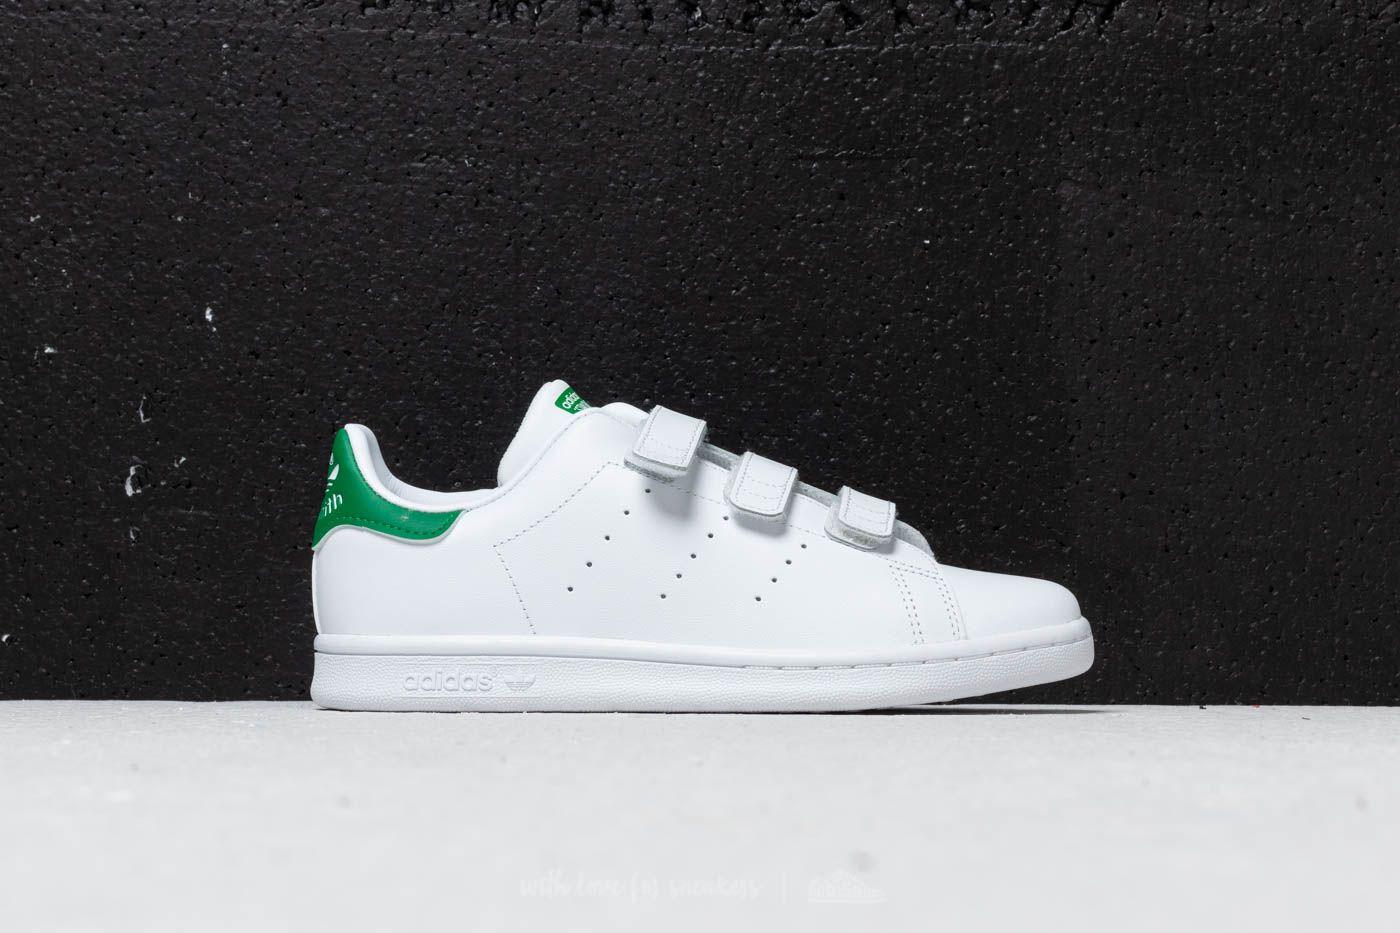 9b57b9856c4 adidas Stan Smith CF C Footwear White/ Green at a great price 33 € buy